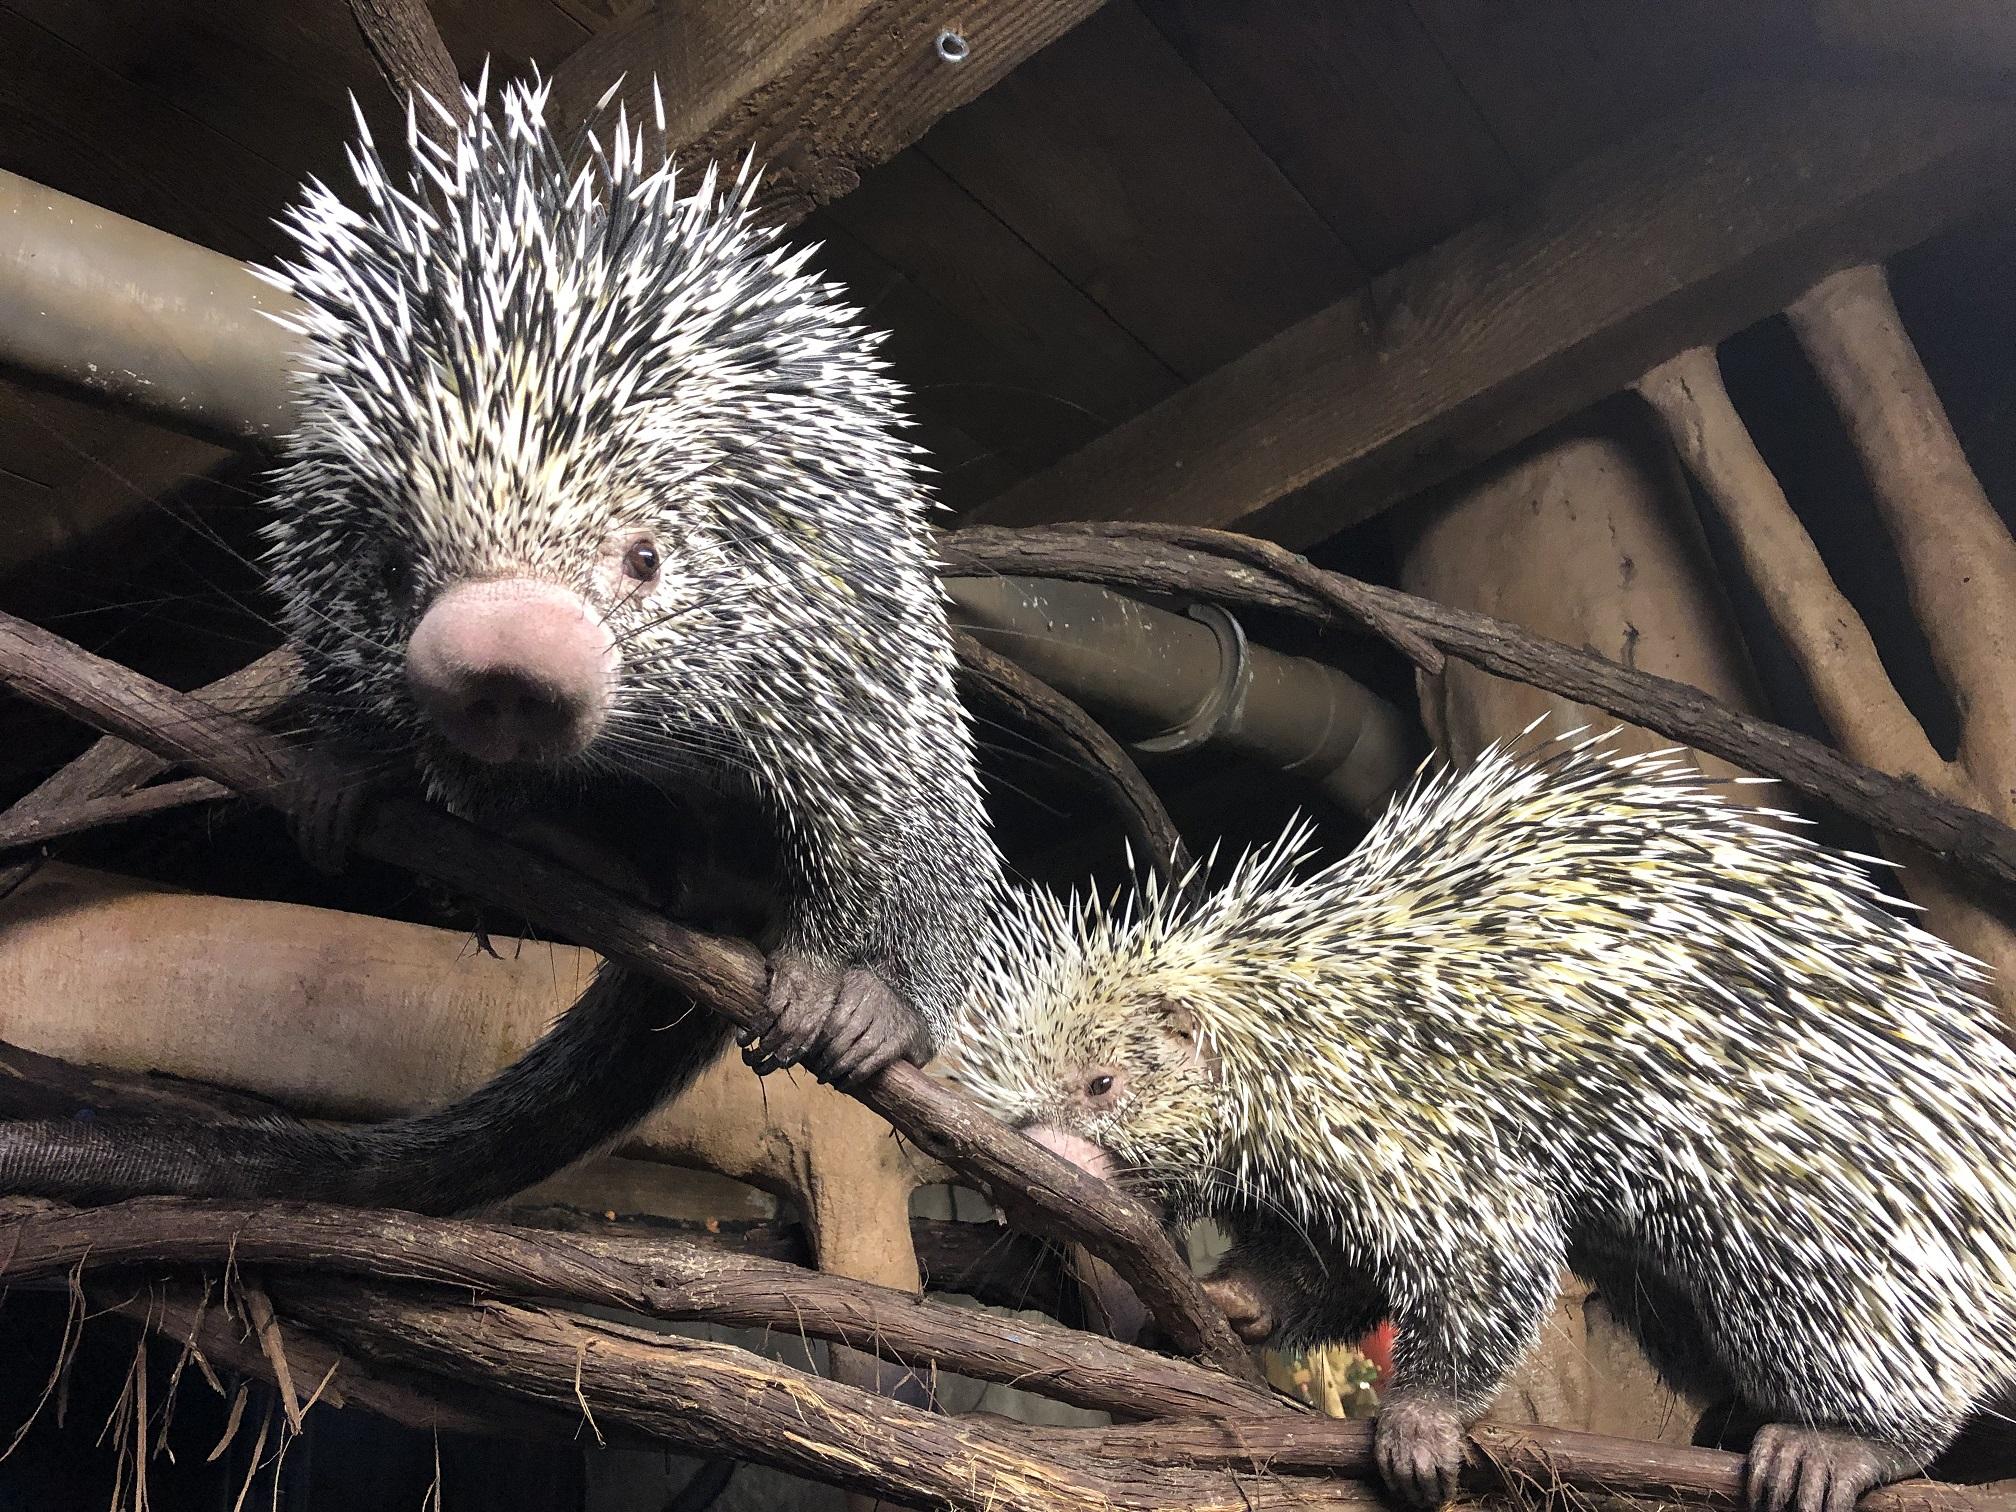 Porcupines climbing